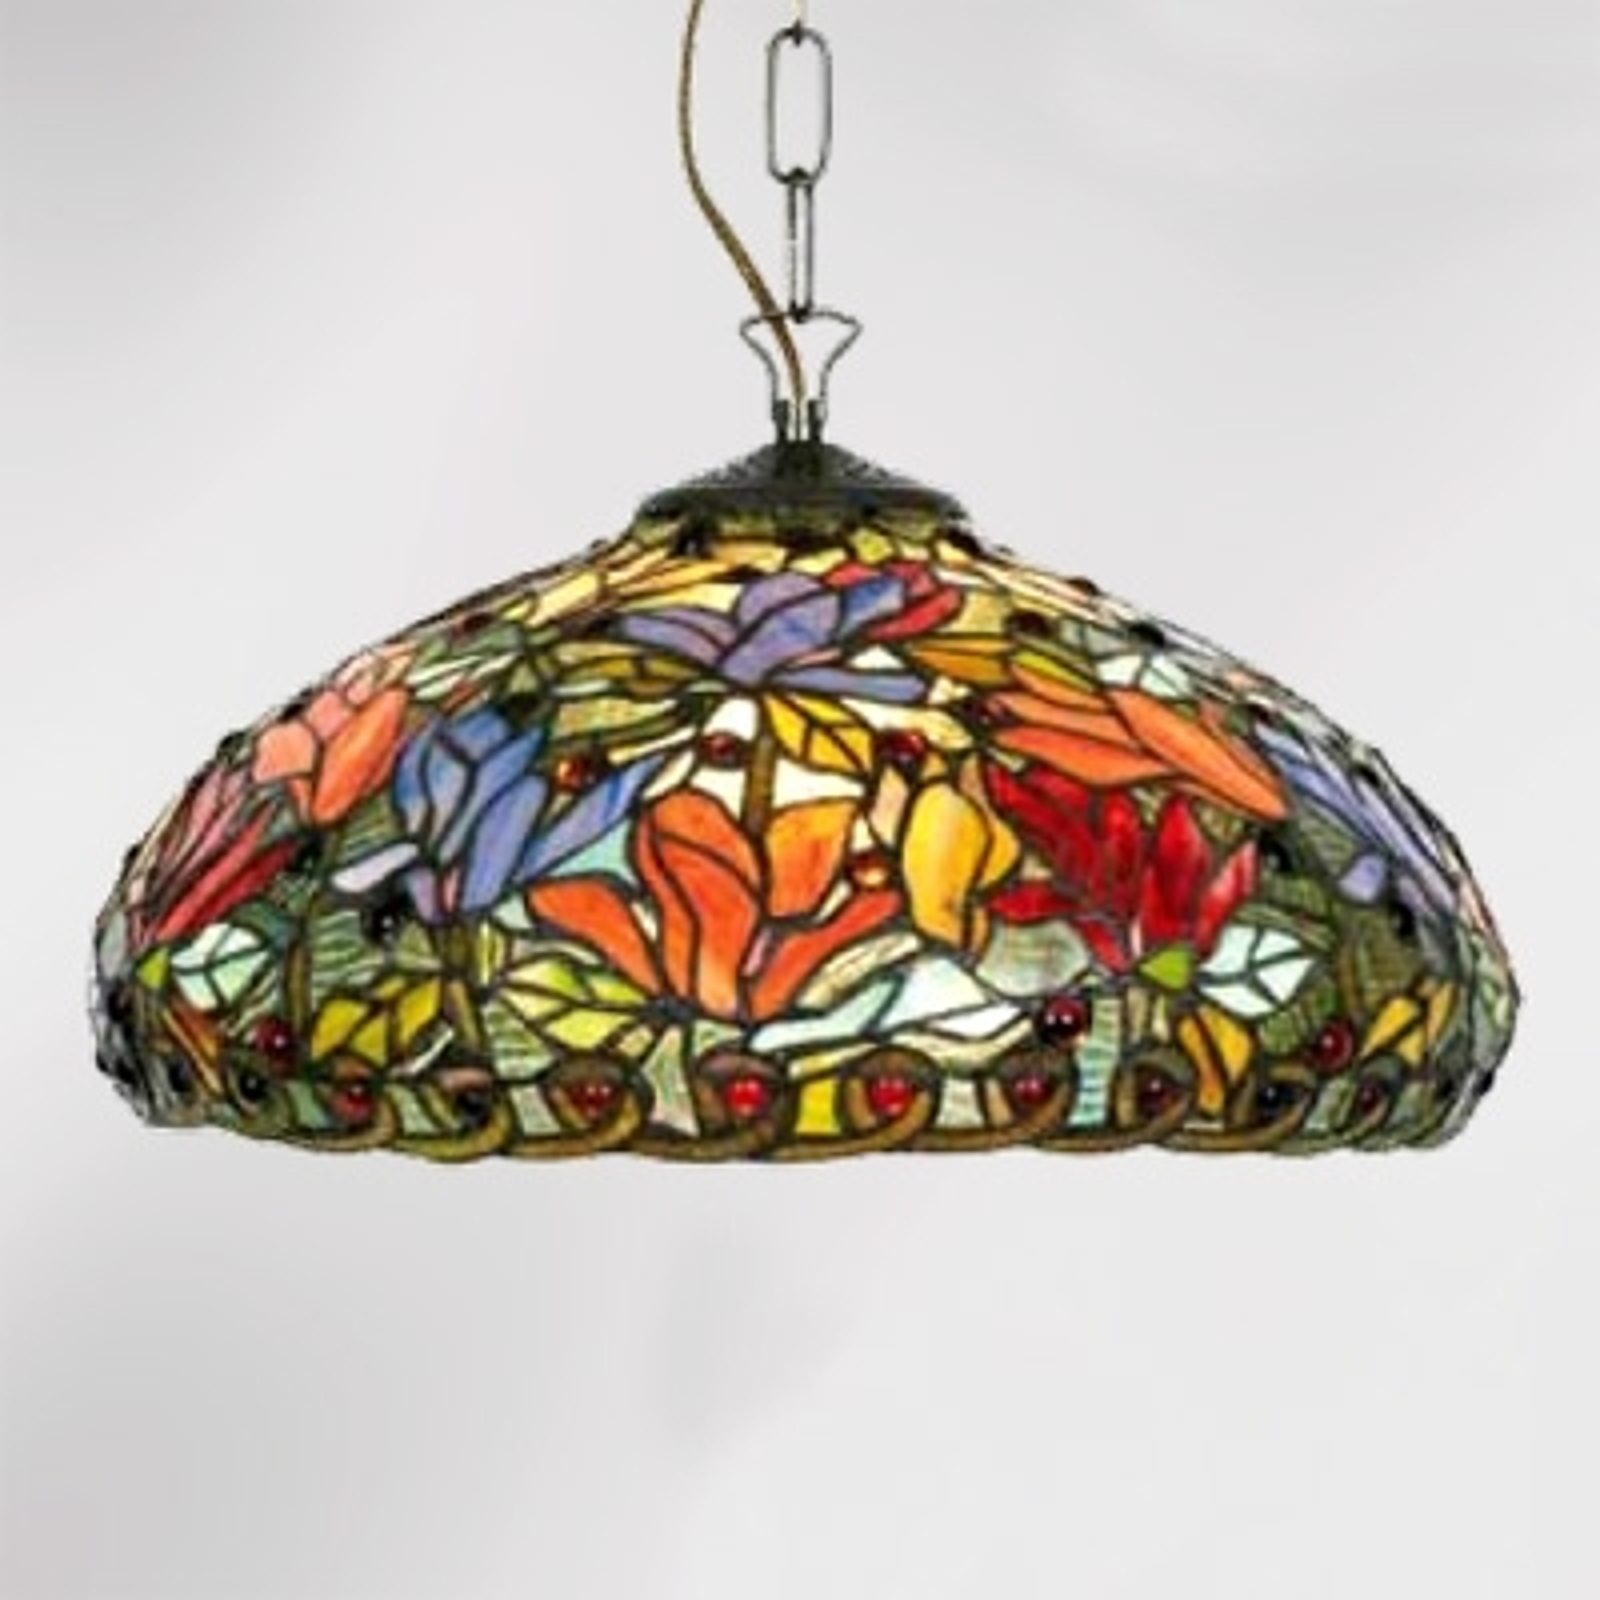 Suspension Elaine style Tiffany à 1 lampe